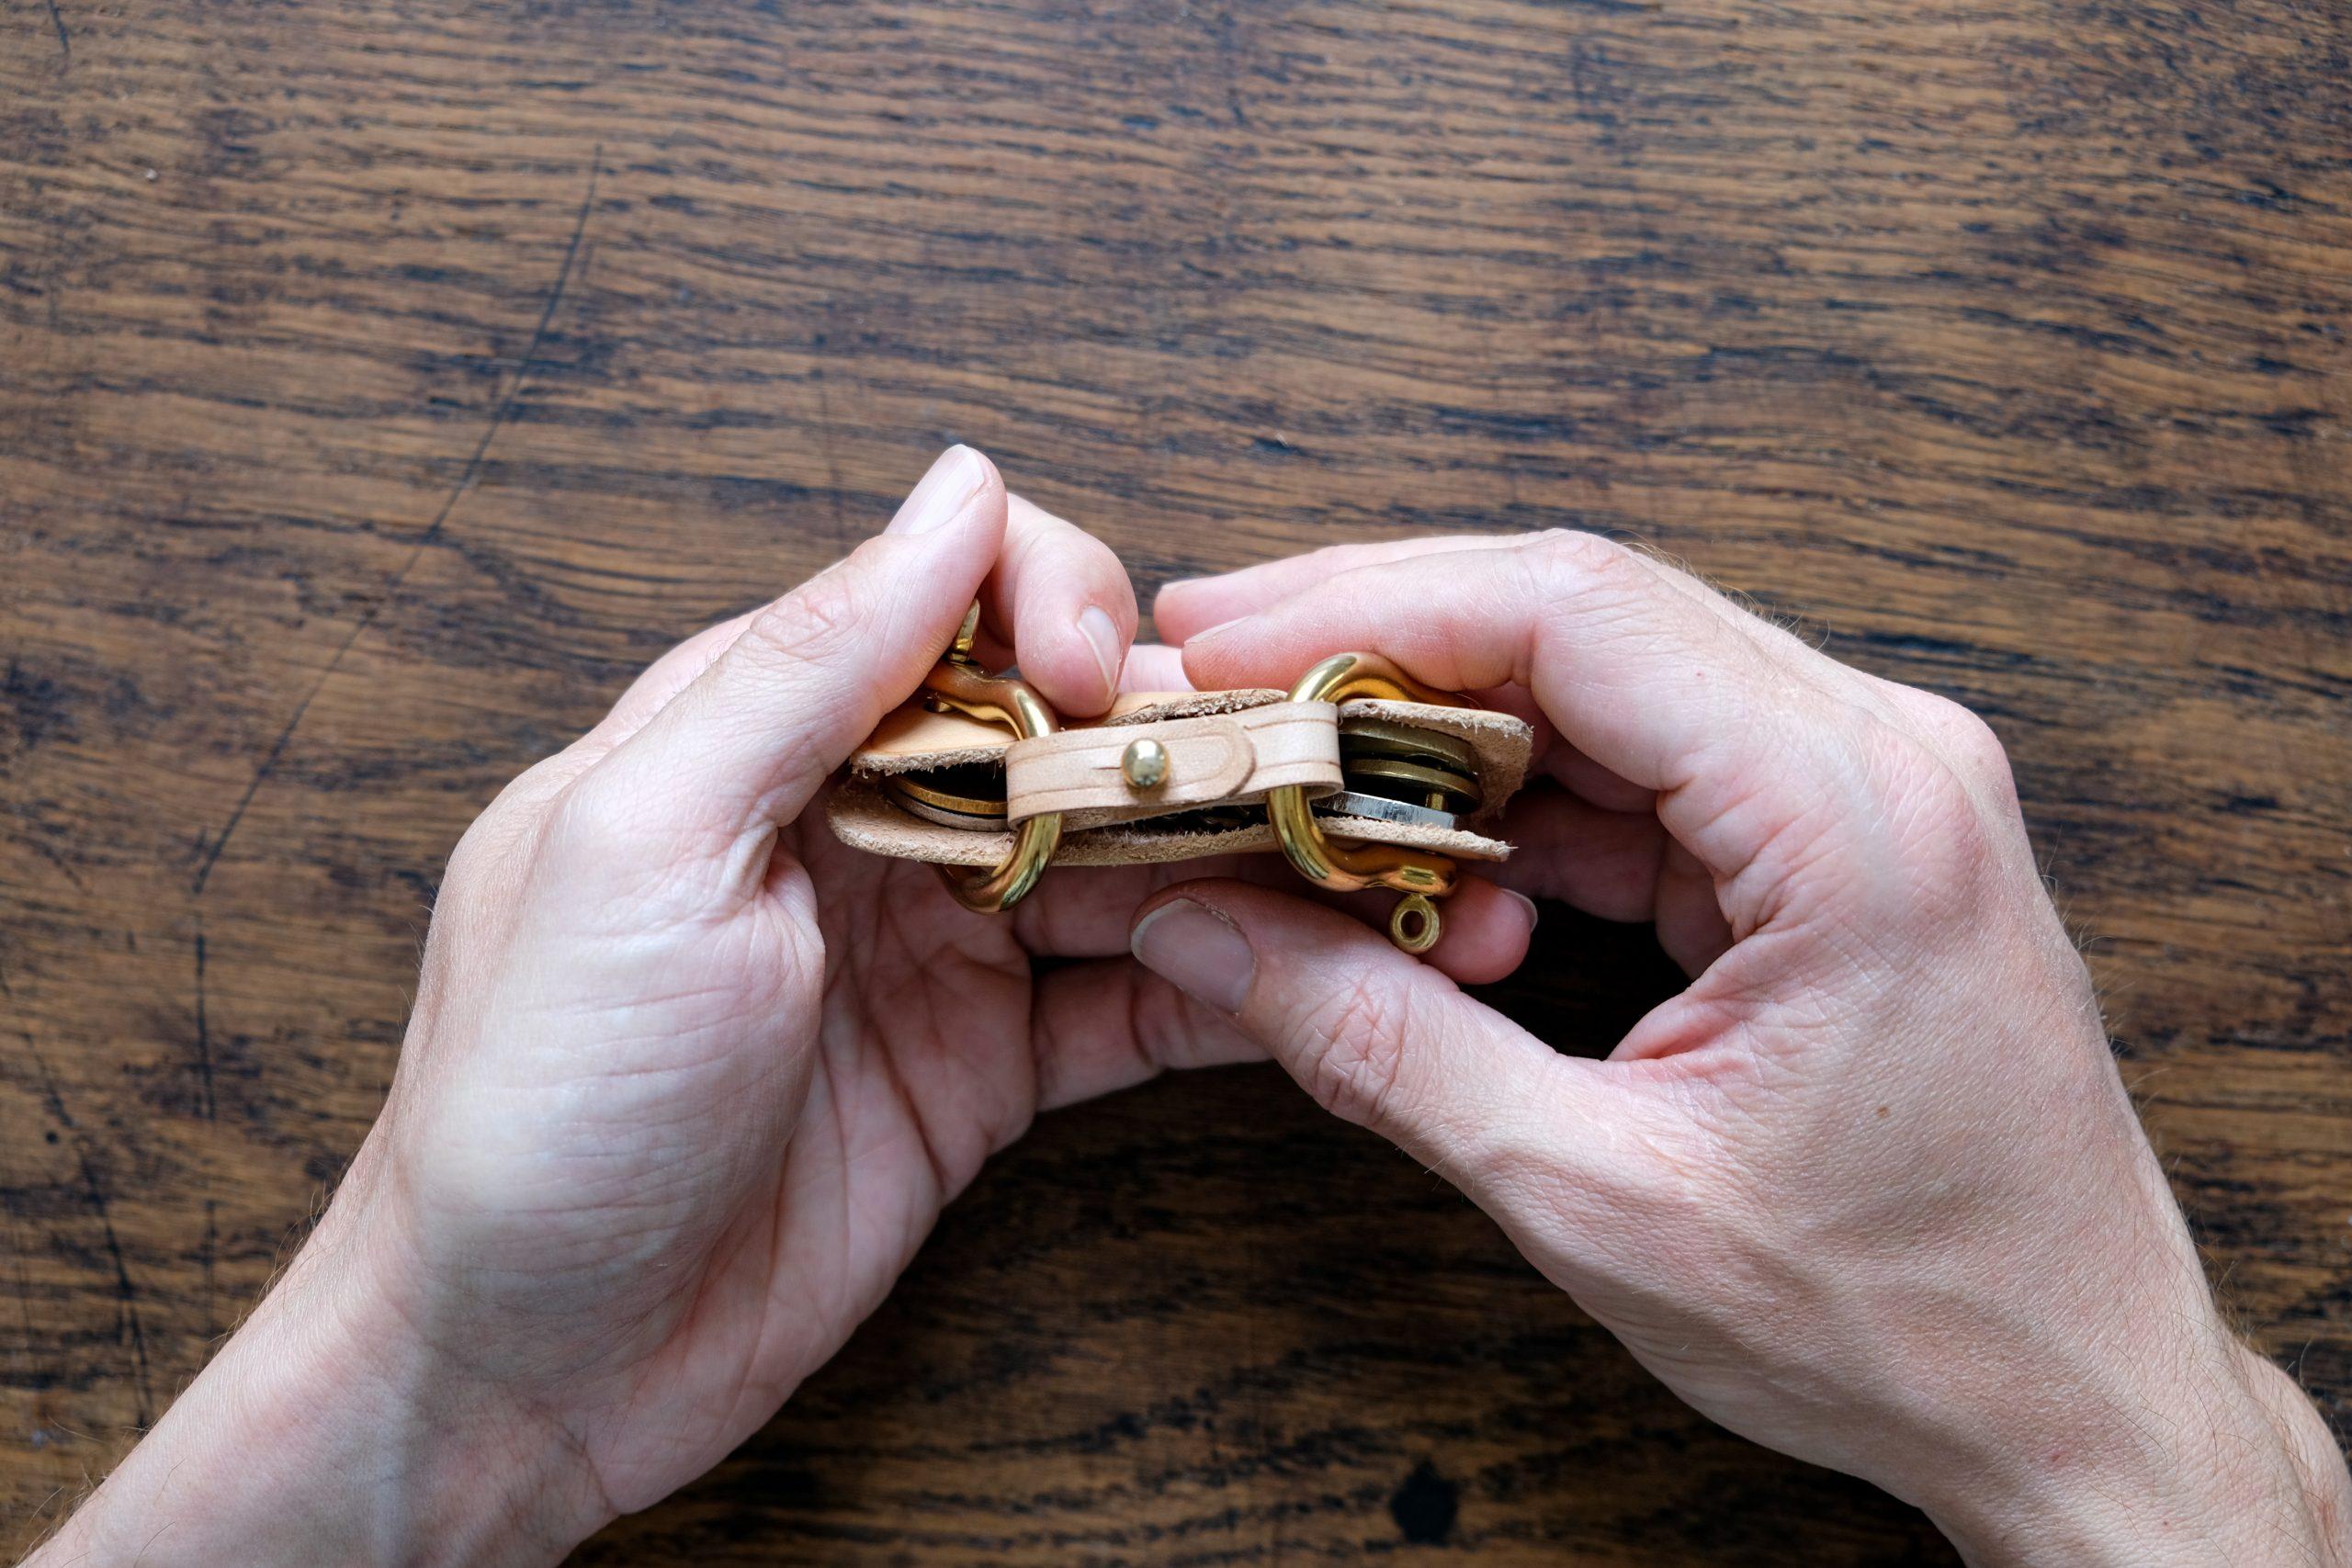 lerif designs leather horse buckle key holder demo hands on wood background